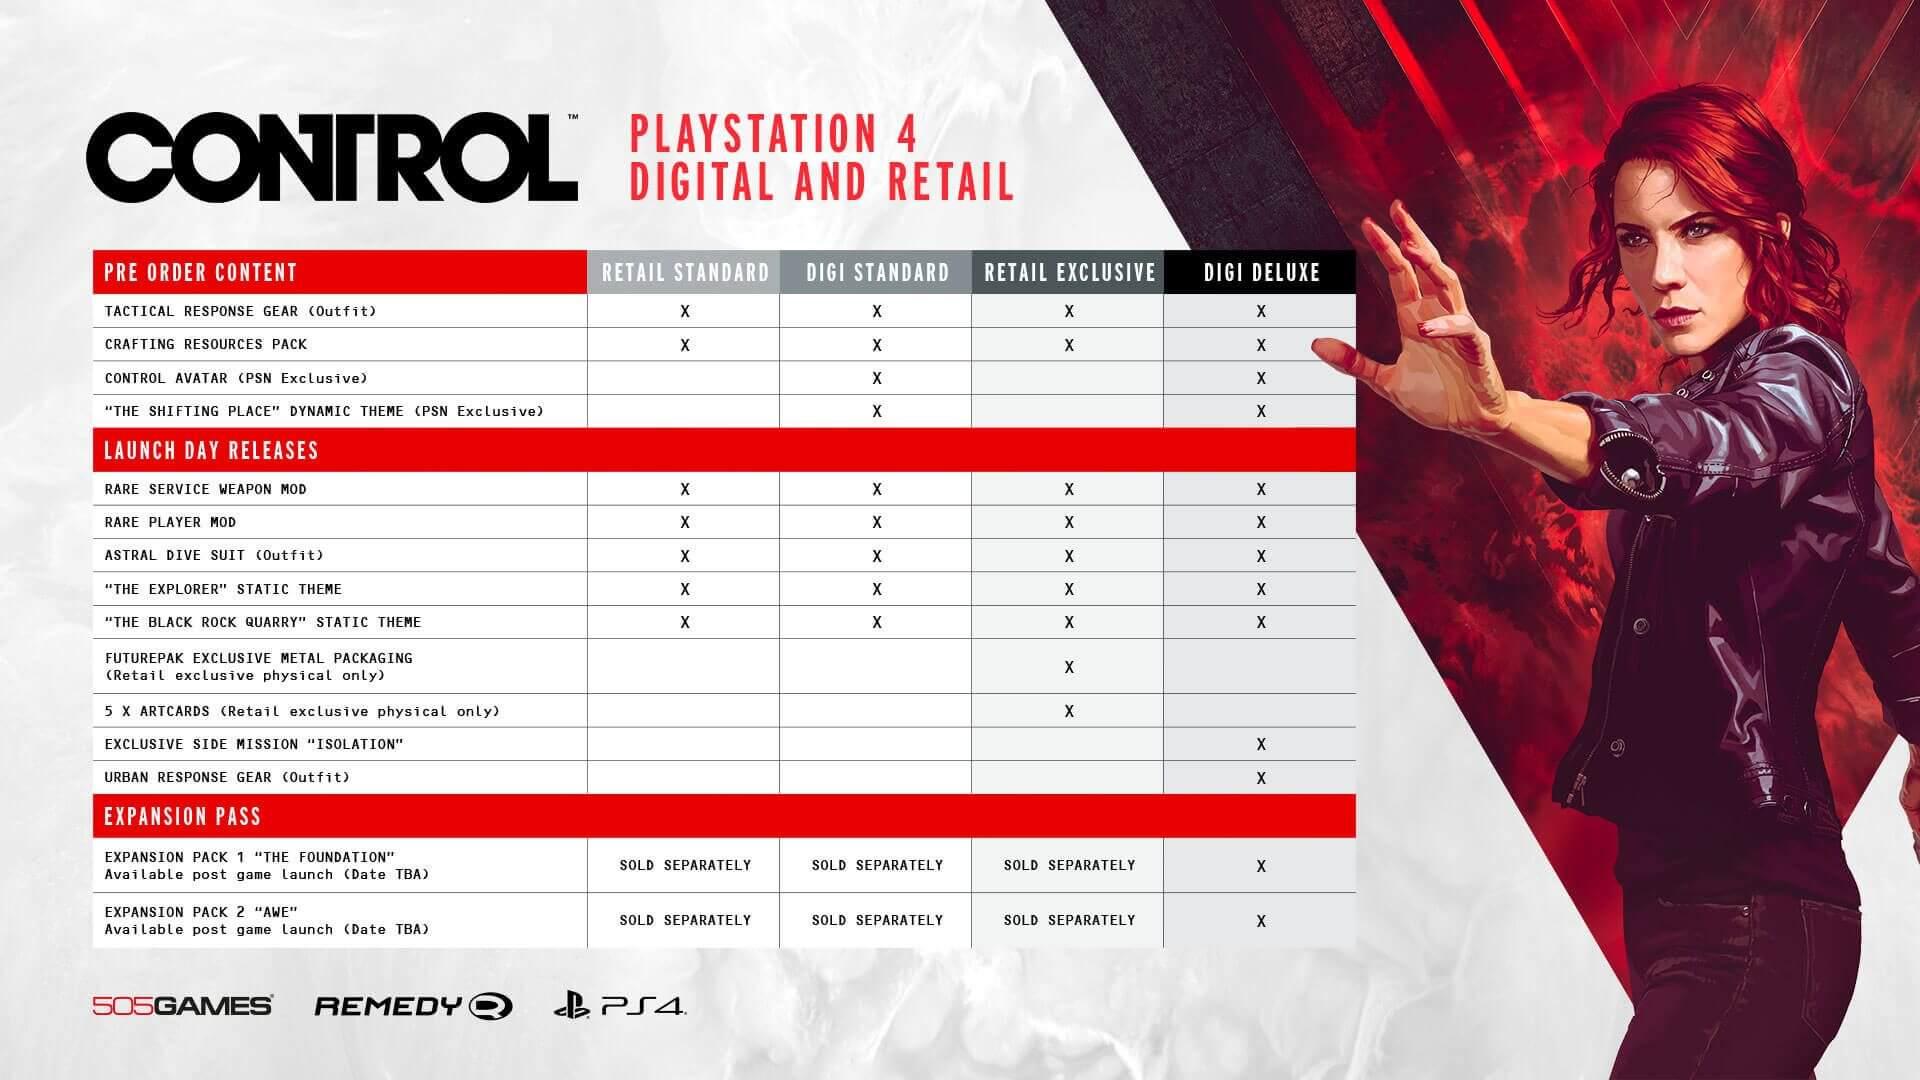 Control PS4 versions e1553617707637